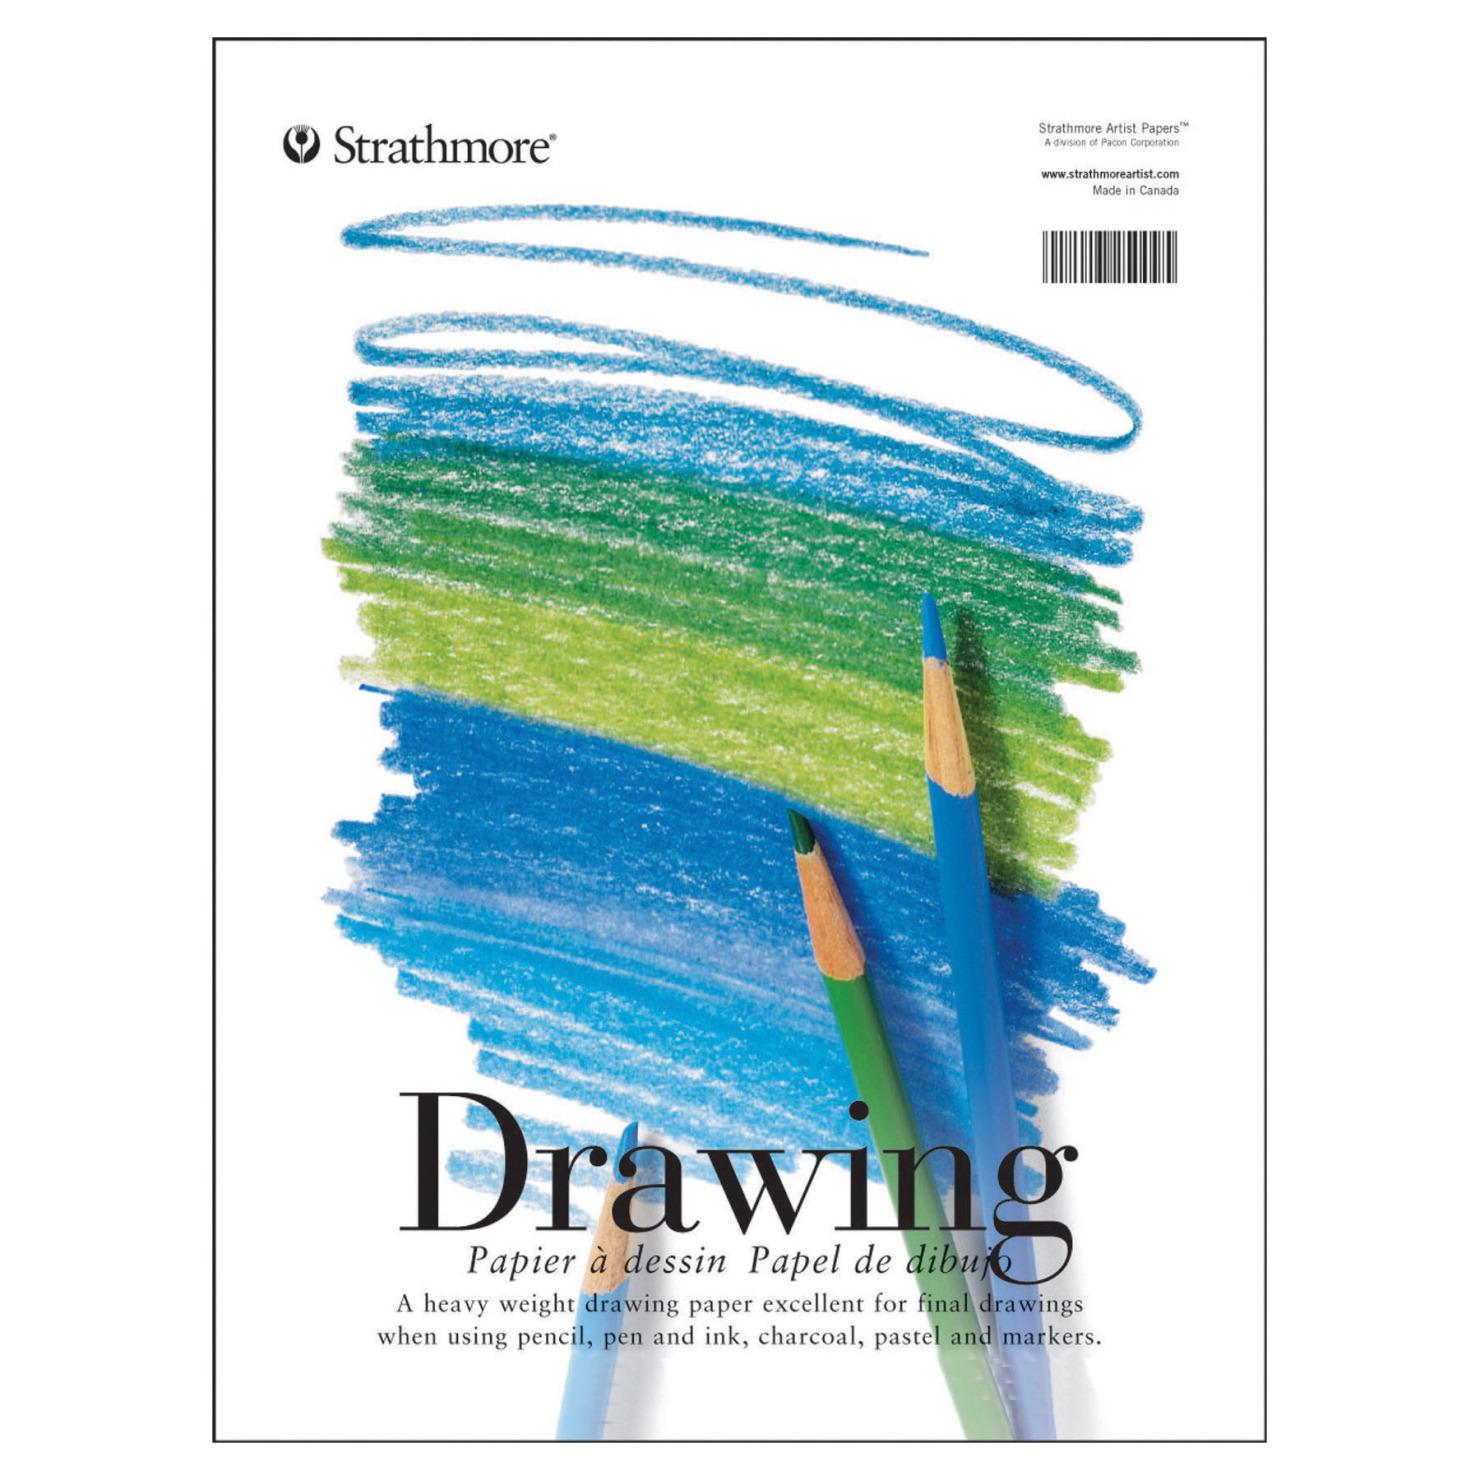 Strathmore 200 Series Drawing Pad